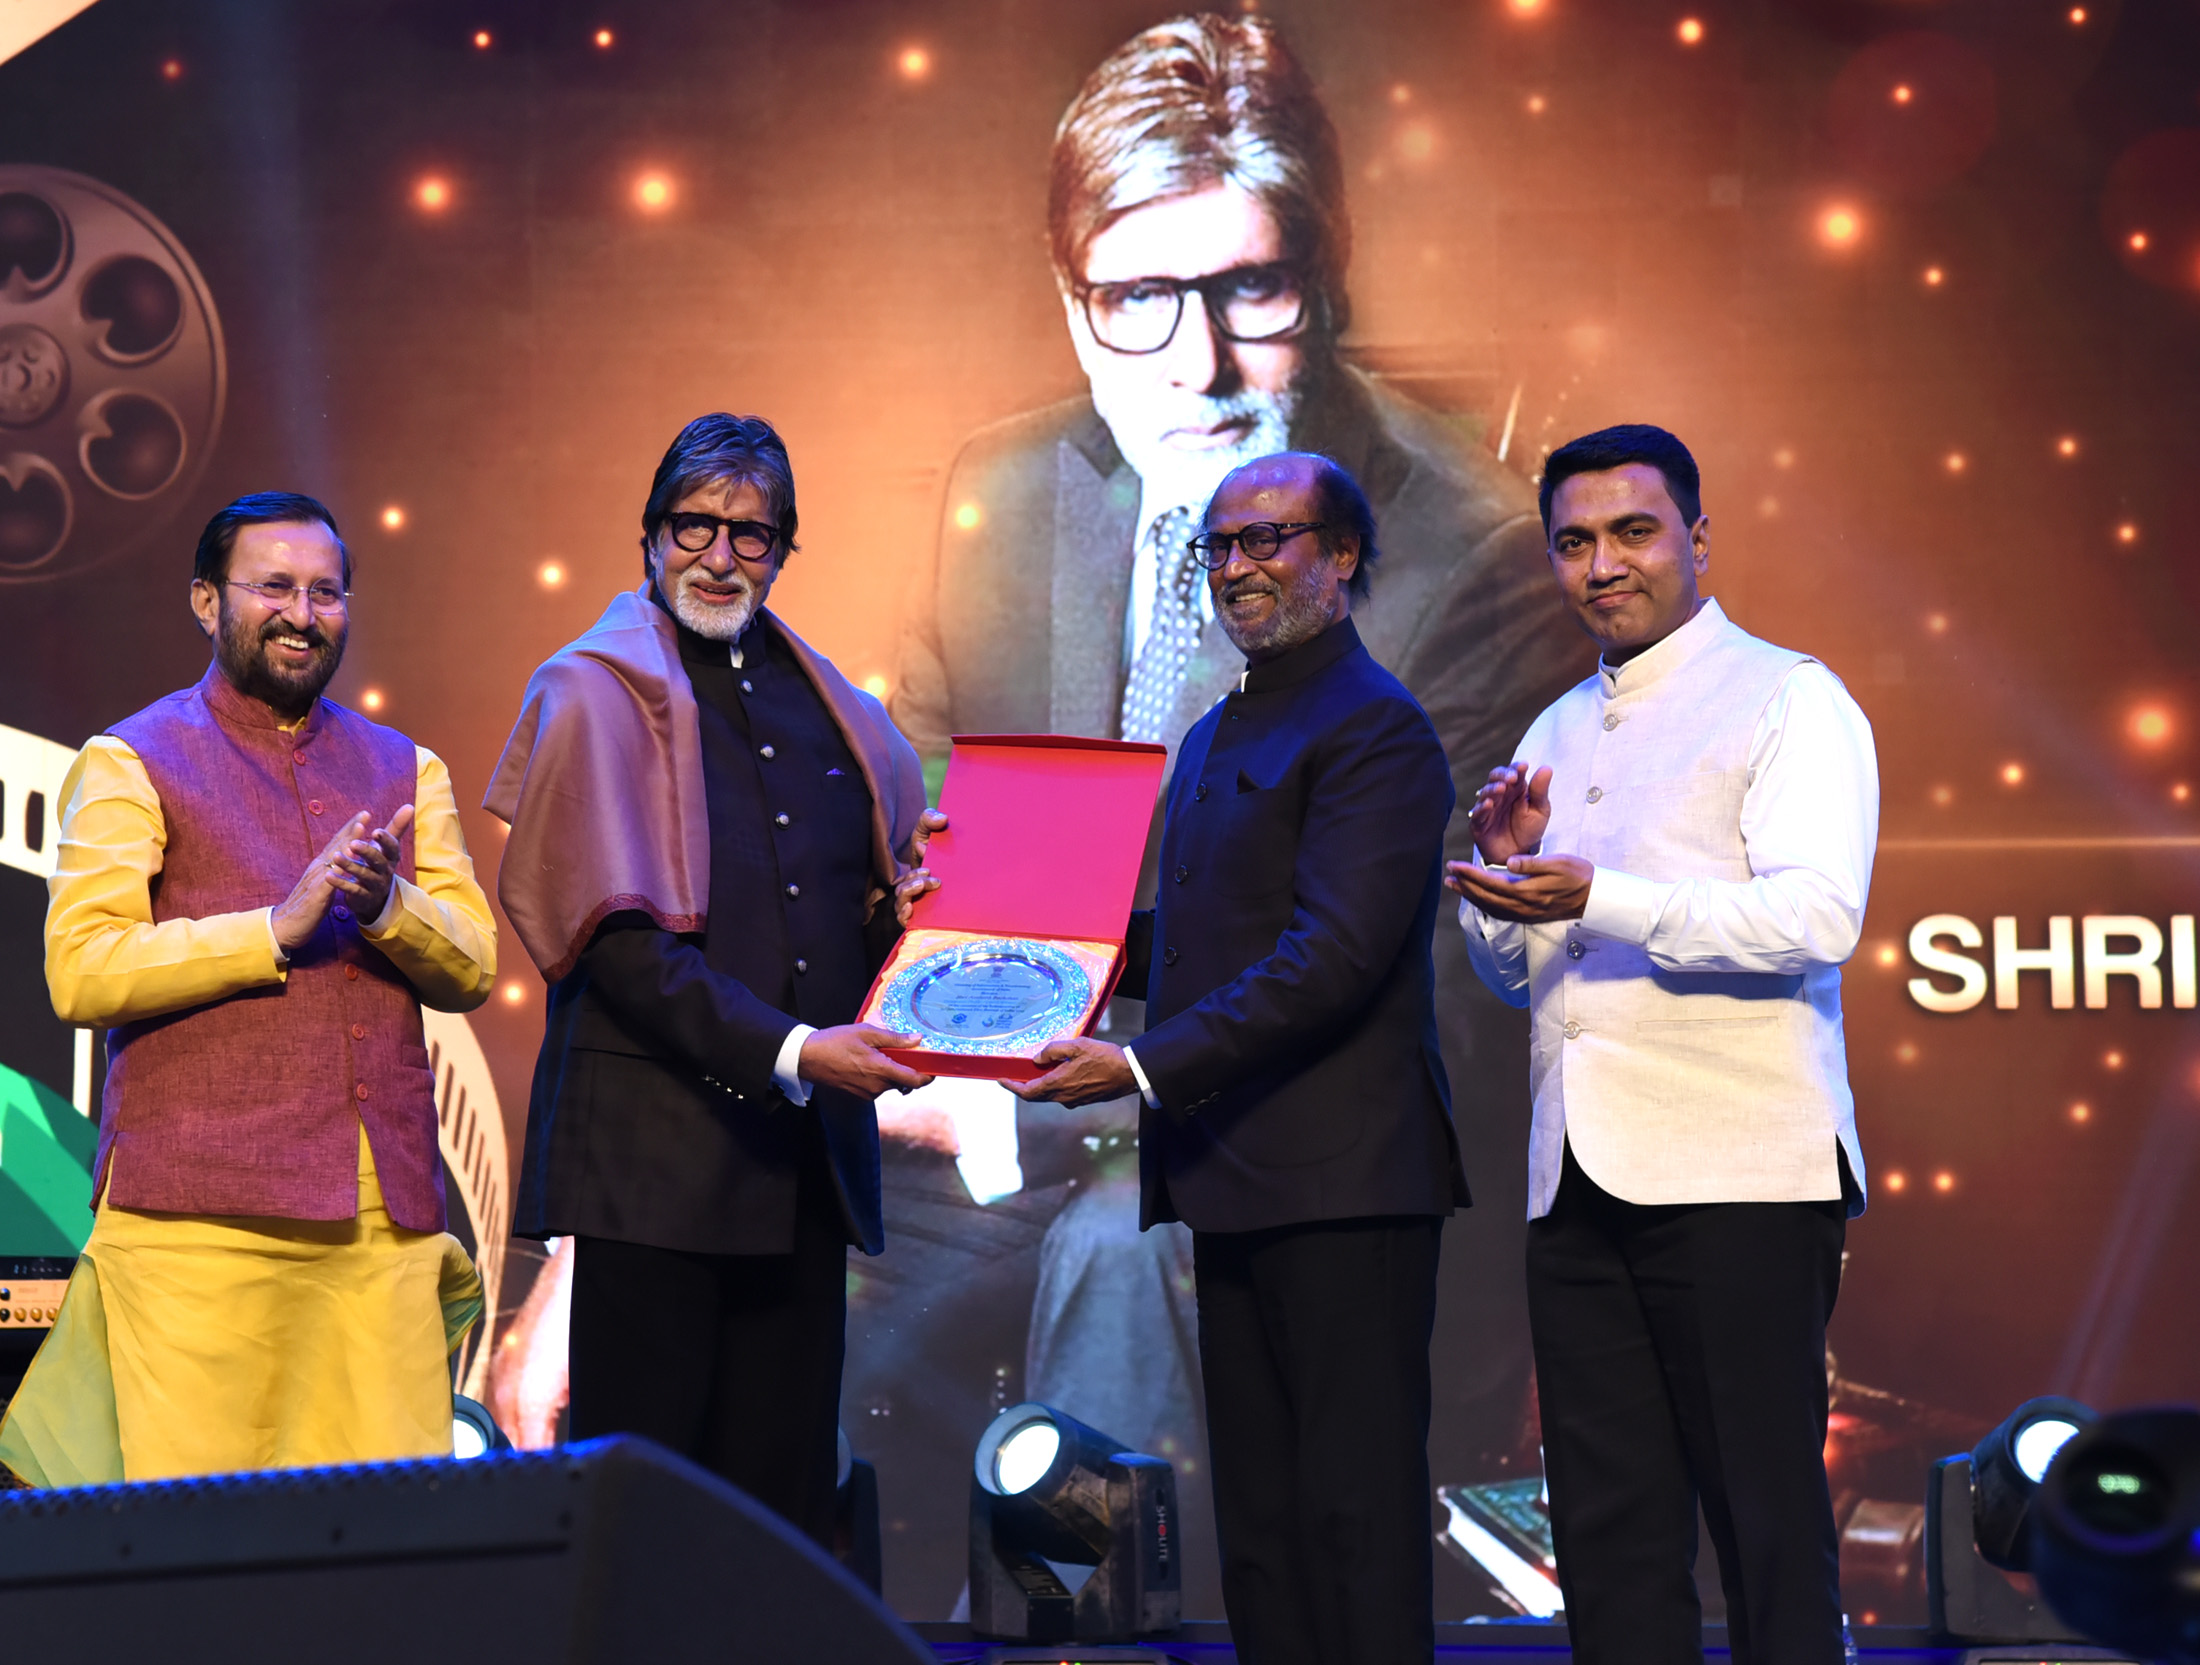 Amitabh Bachchan and Rajinikanth at IFFI 2019